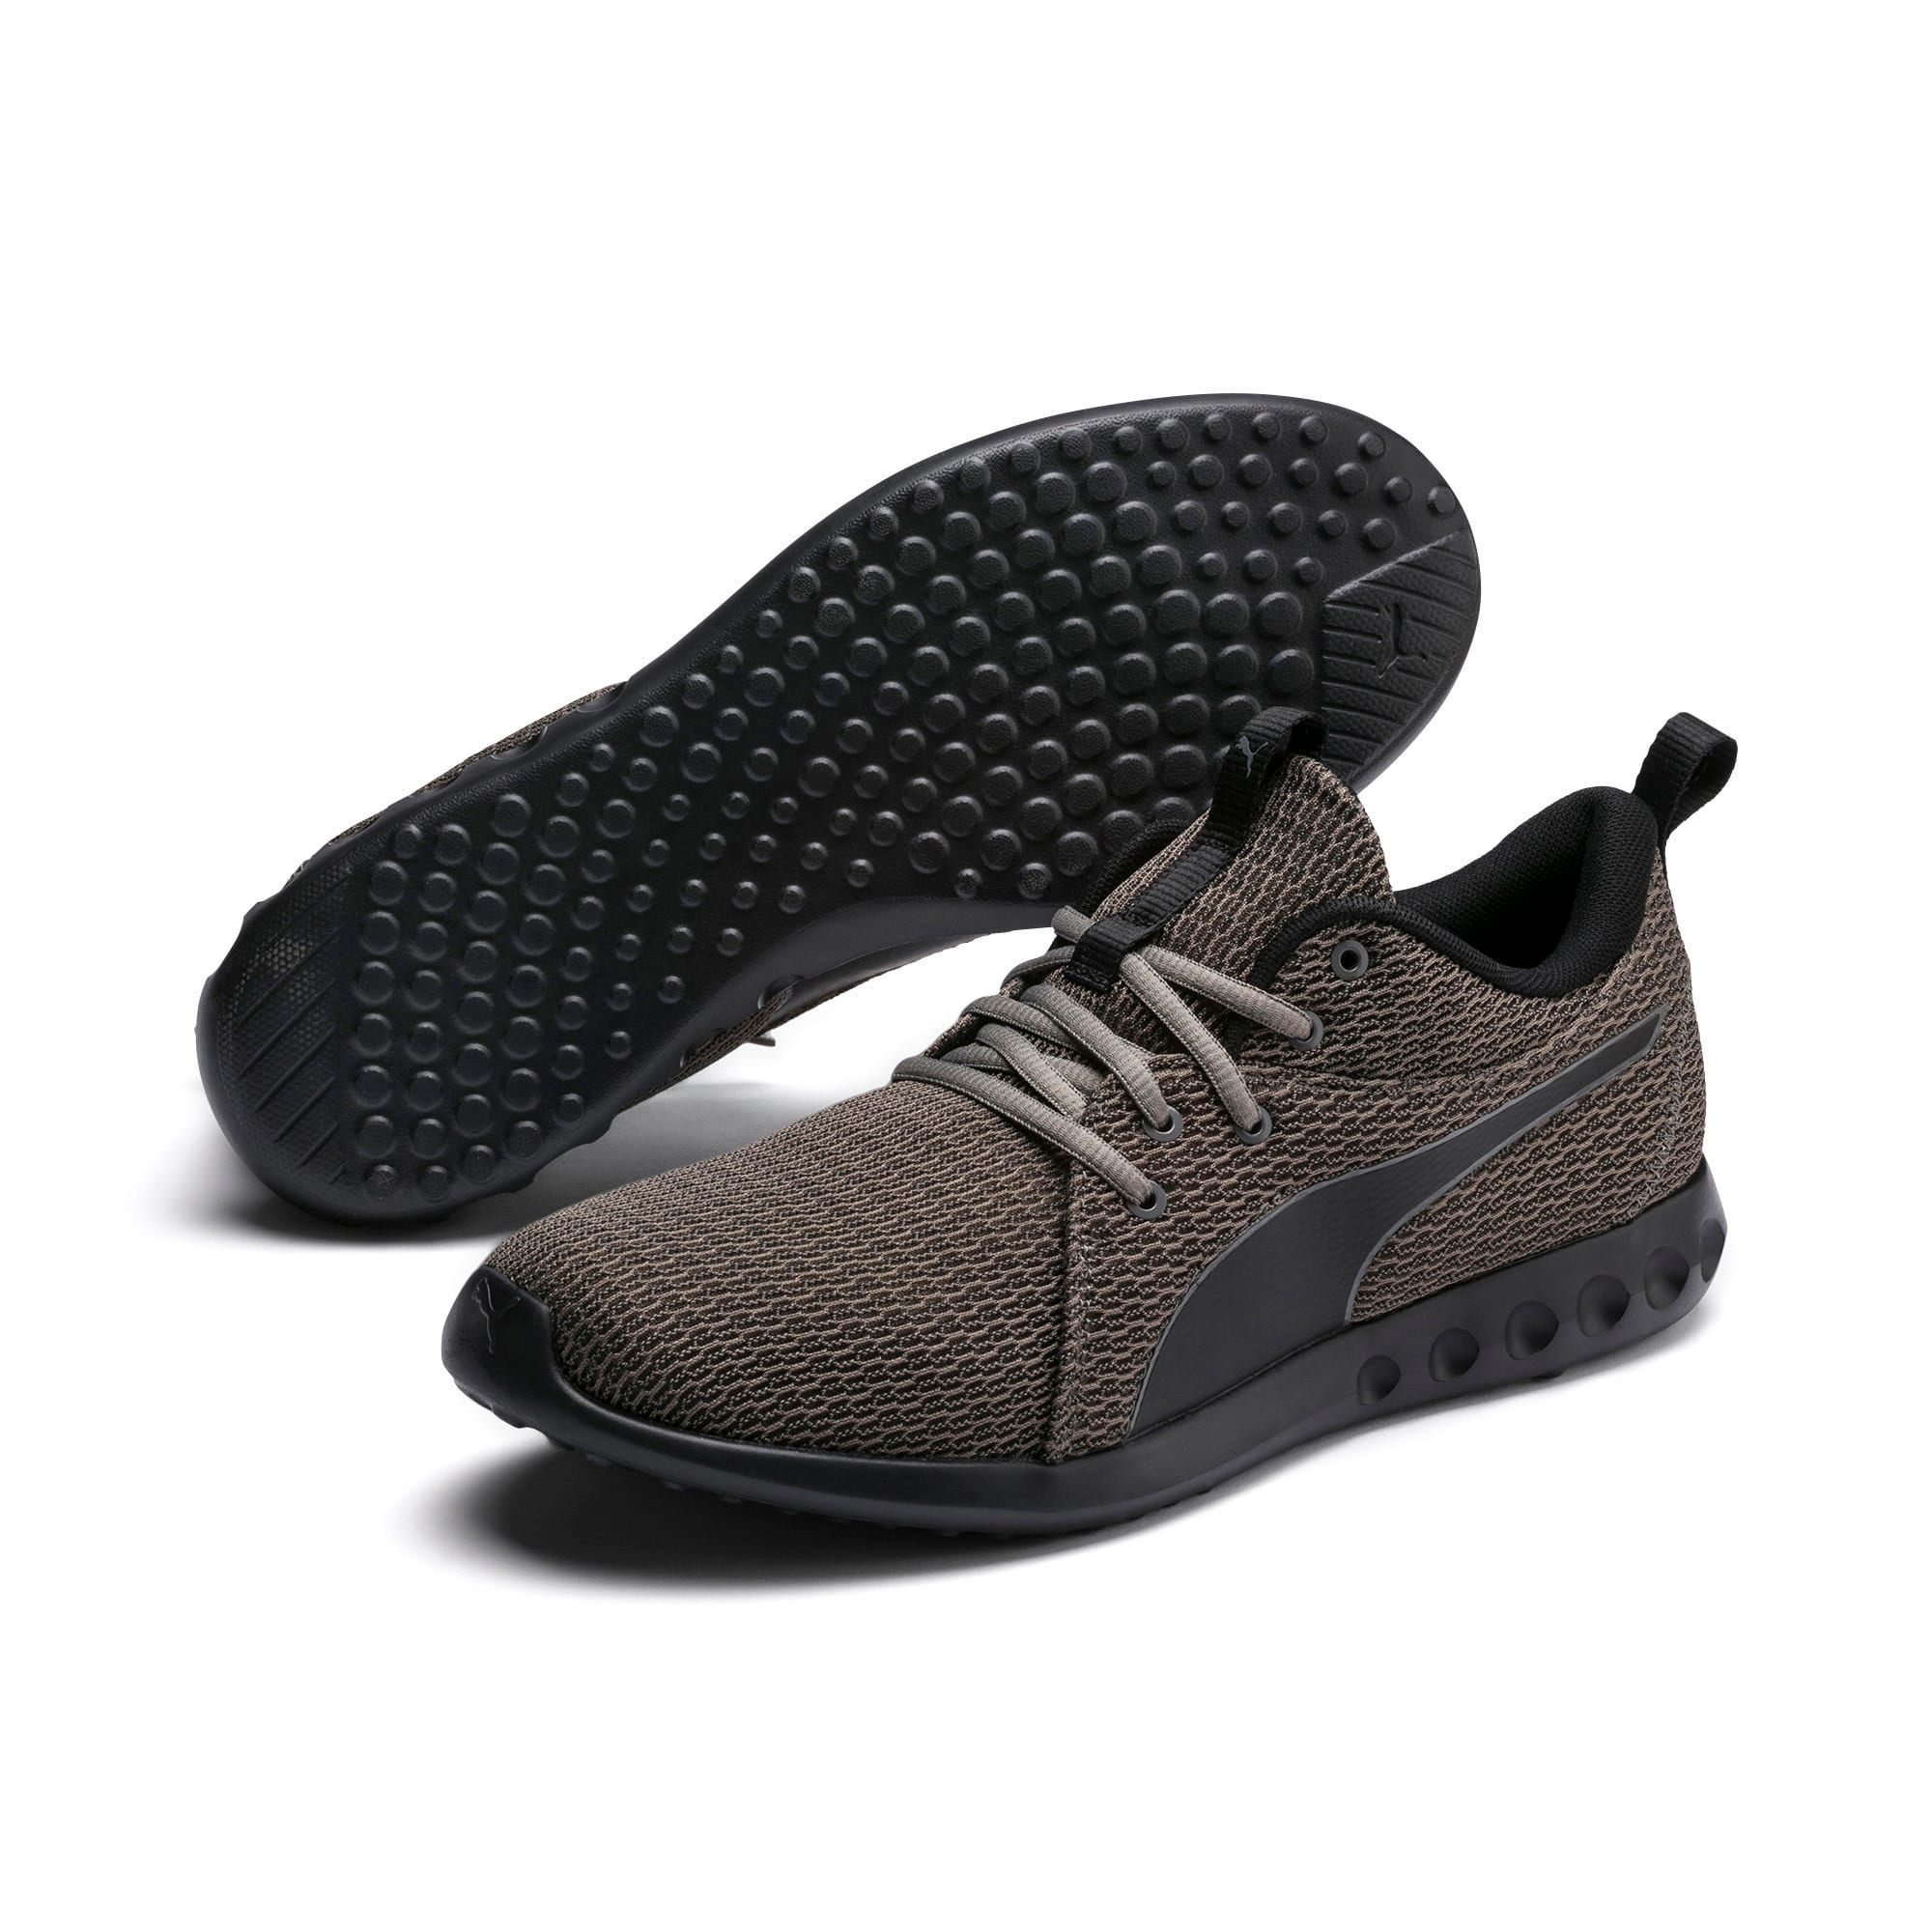 Miniatura 2 de Zapatos para correrCarson 2 New Corepara hombre, Charcoal Gray-Puma Black, mediano